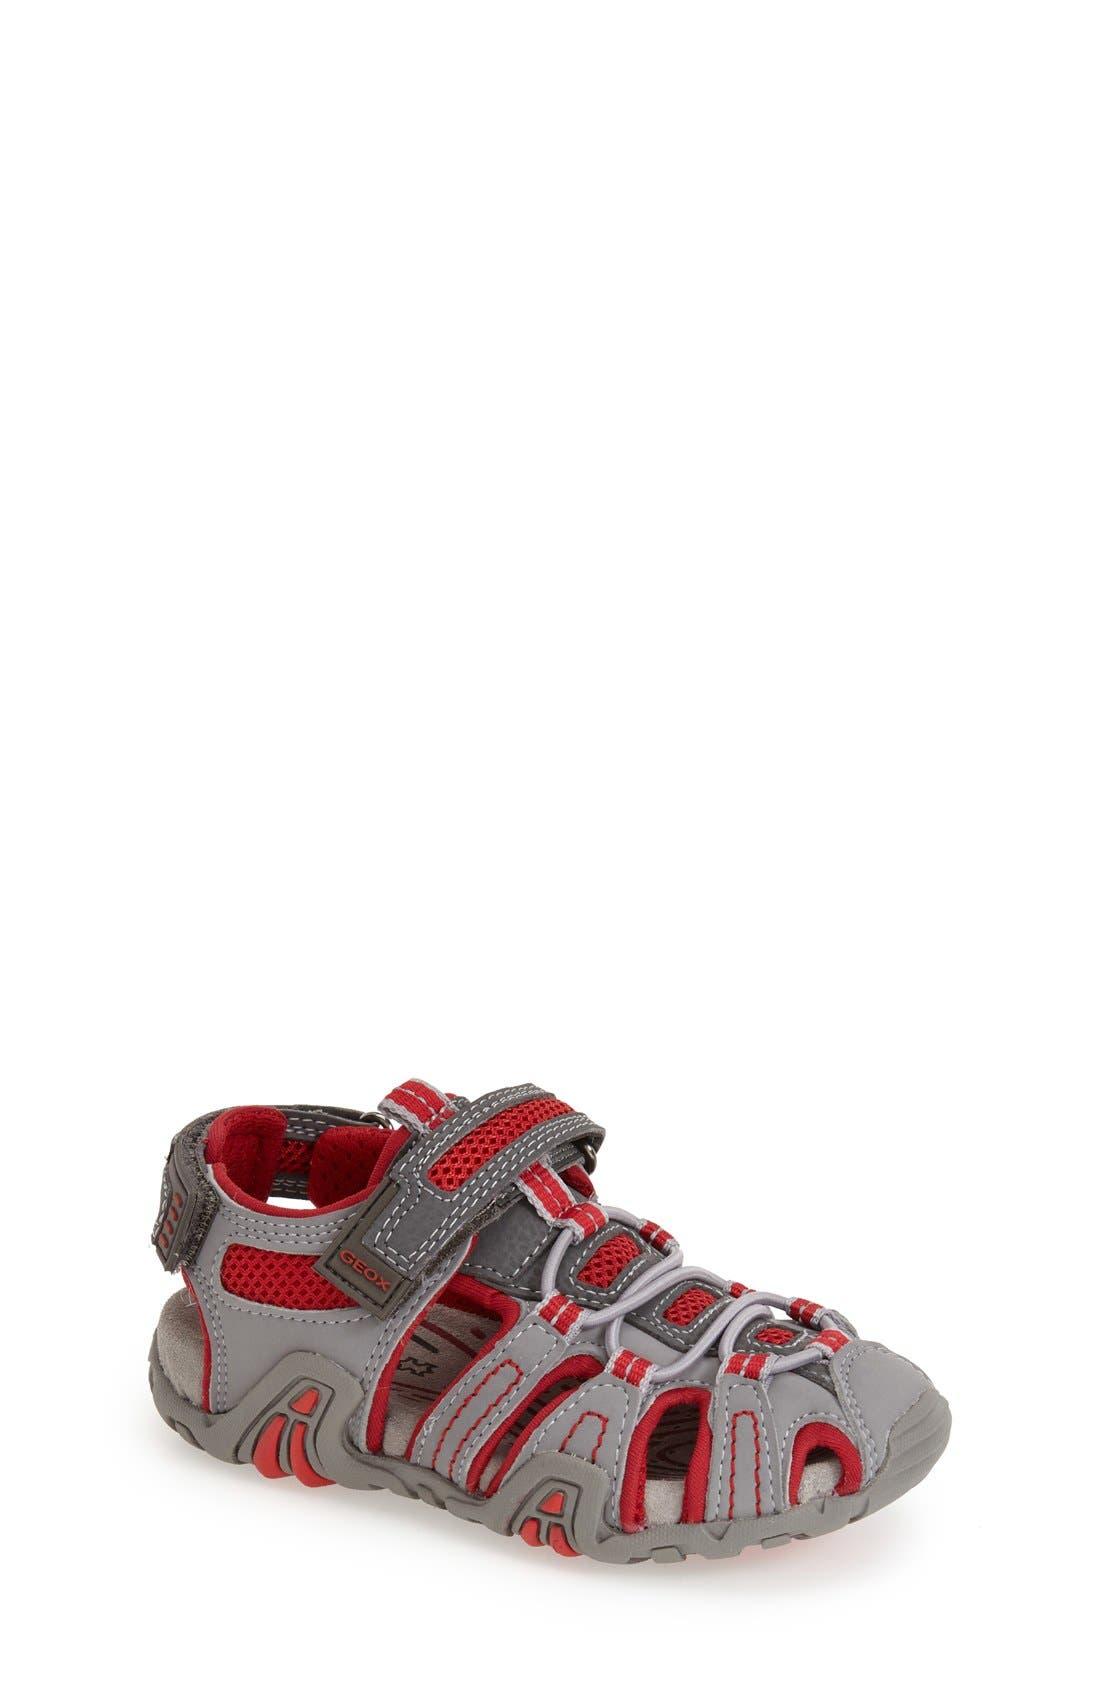 GEOX Jr Kraze 30 Sandal